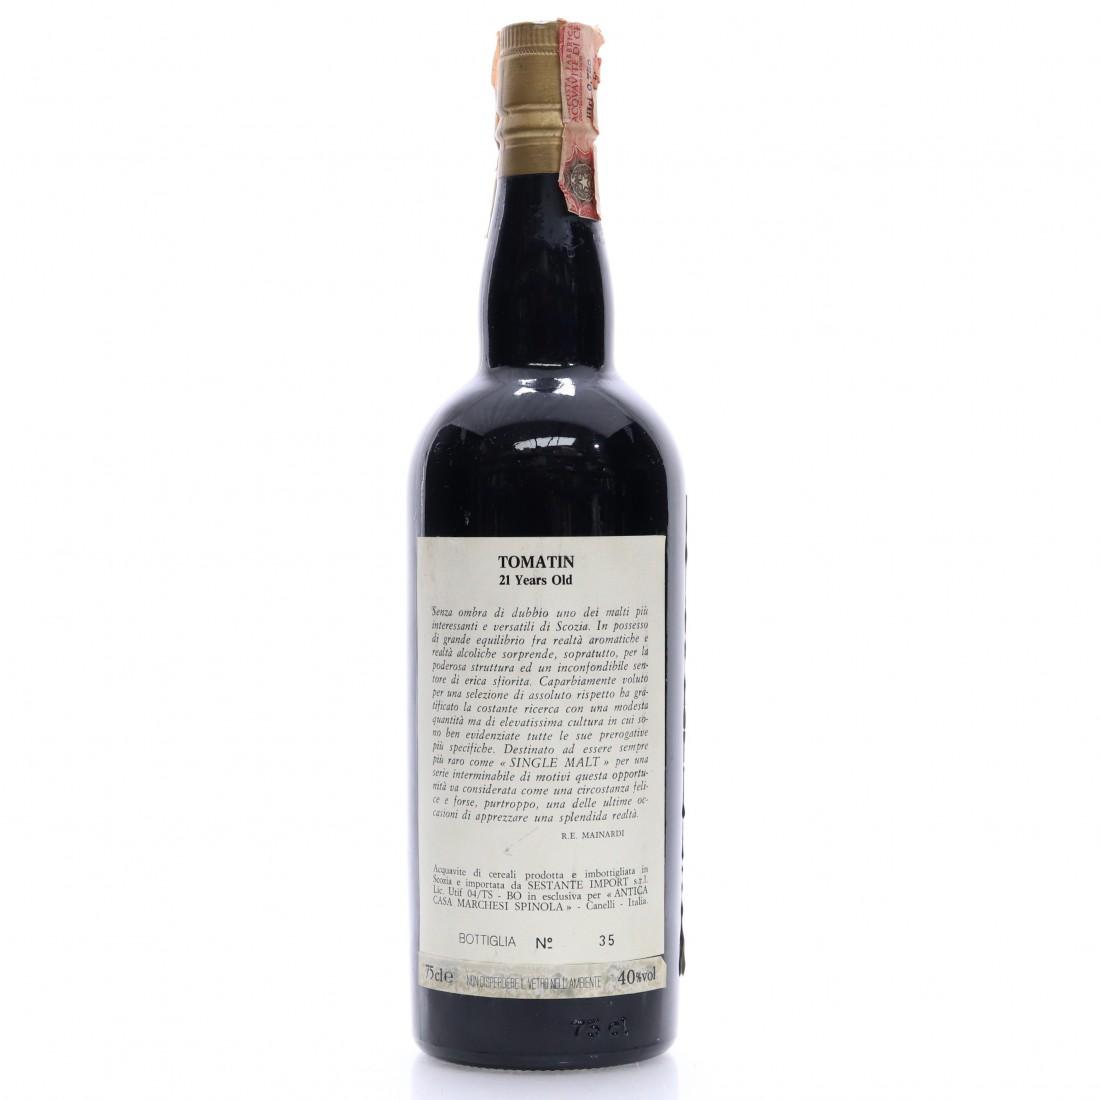 Tomatin 1968 Sestante 21 Year Old / Antica Casa Marchesi Spinola